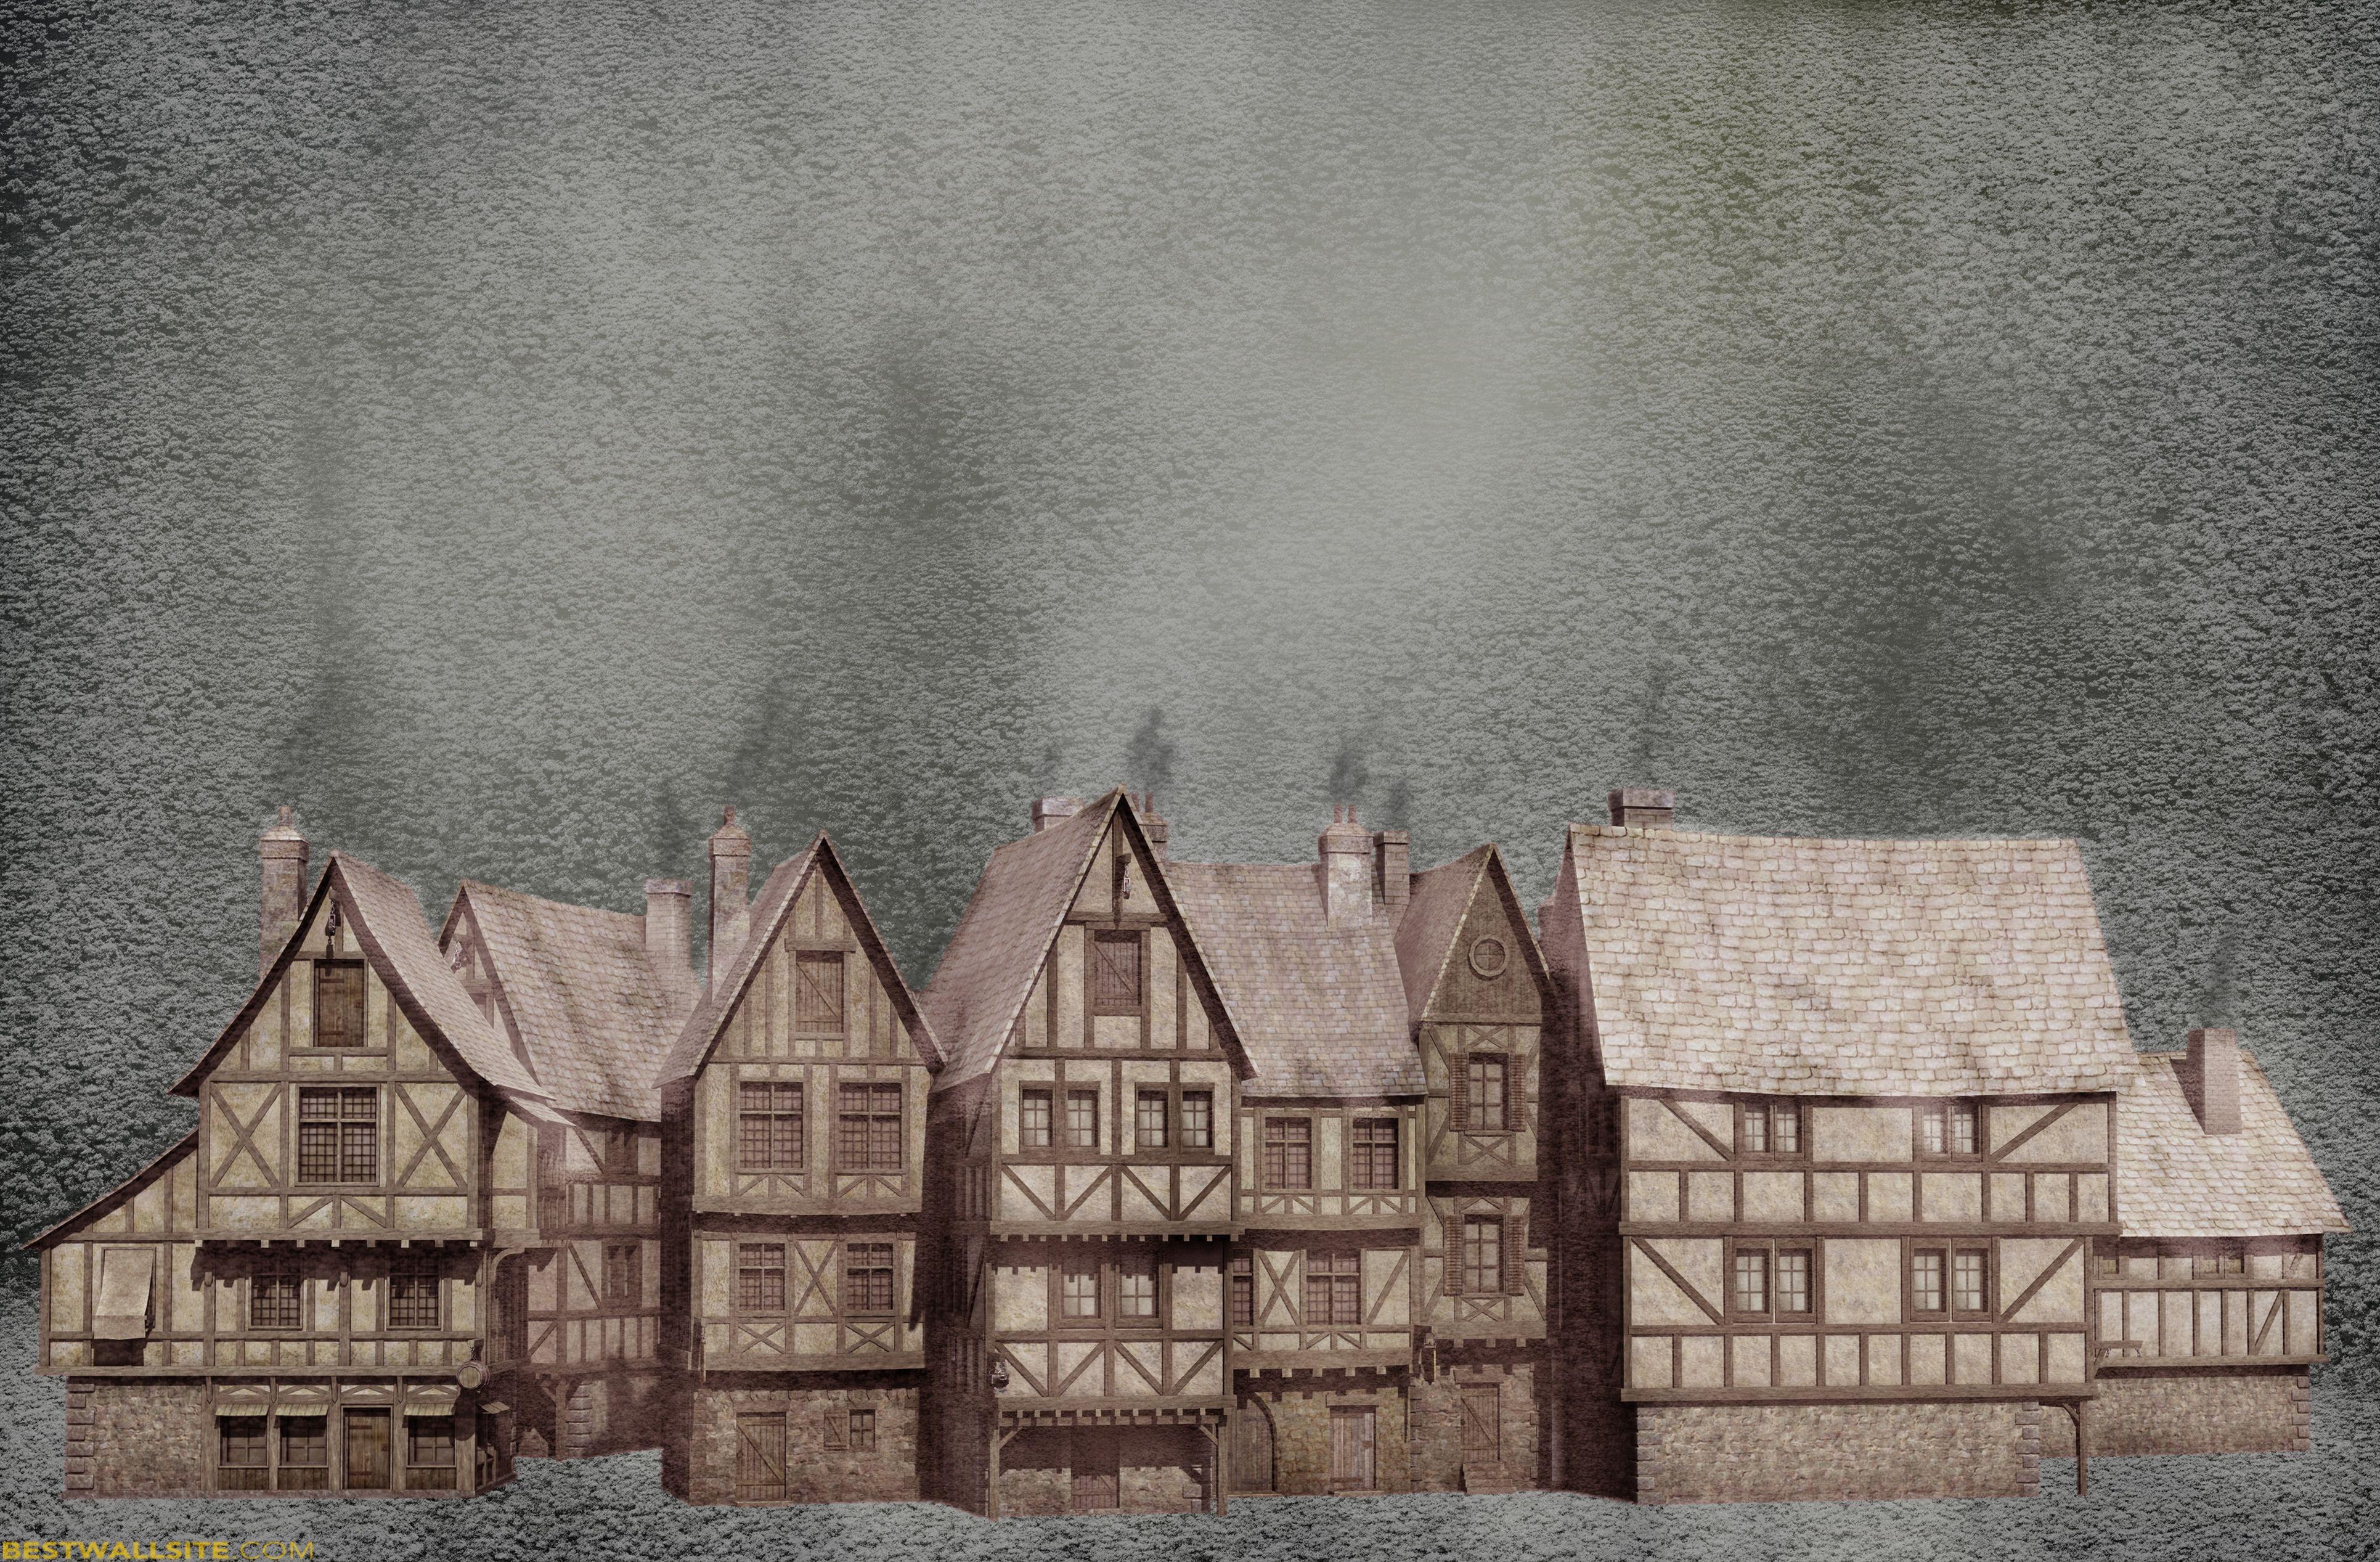 Oliver Twist Snow In The Old Town BestWallSitecom 3862x2534